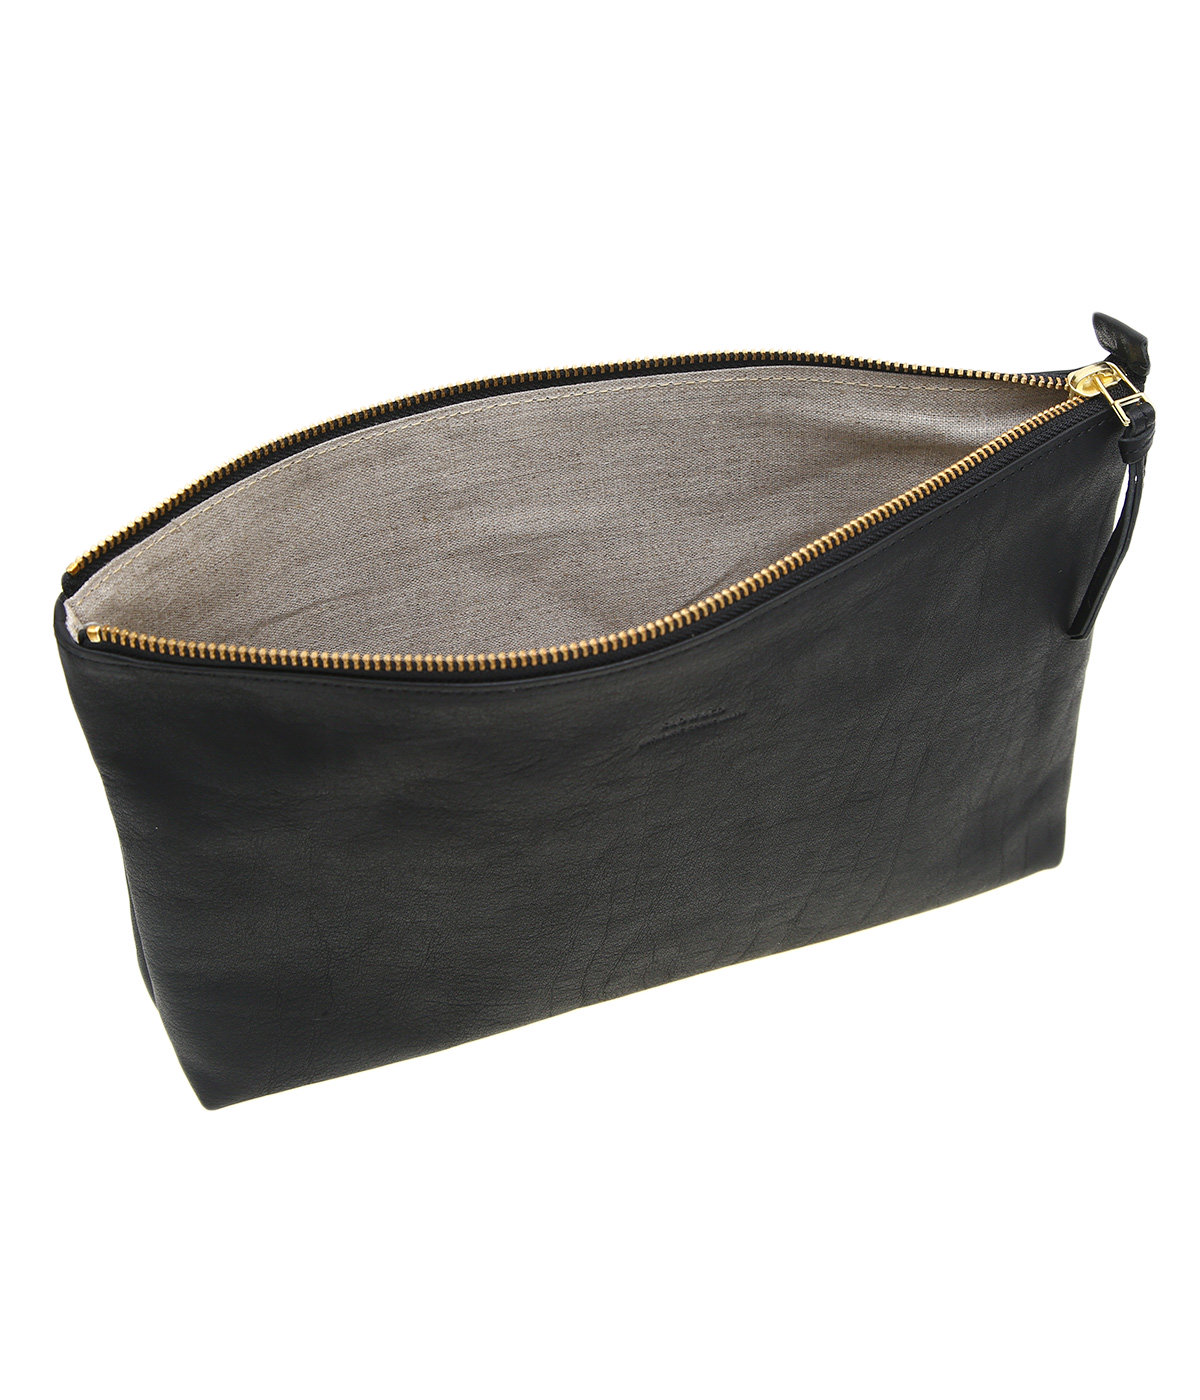 rubono pouch(L)